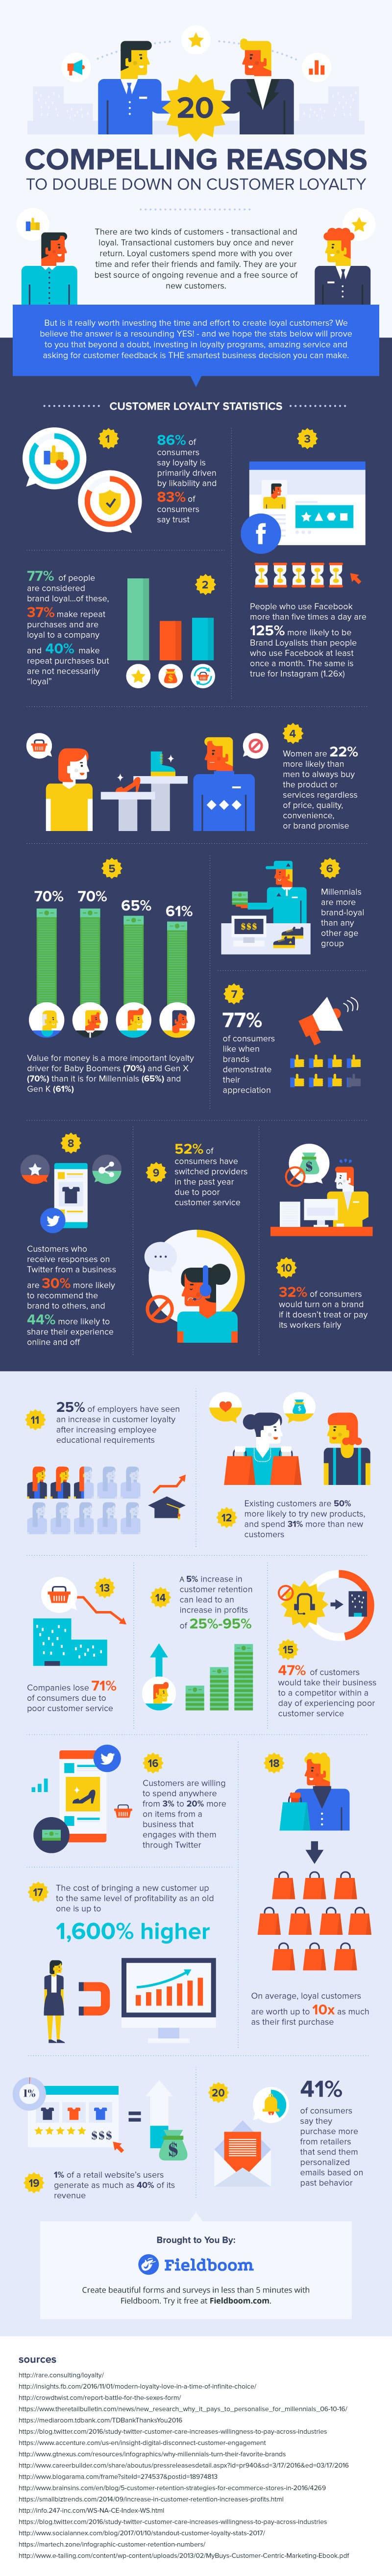 Fieldbloom customer loyalty infographic